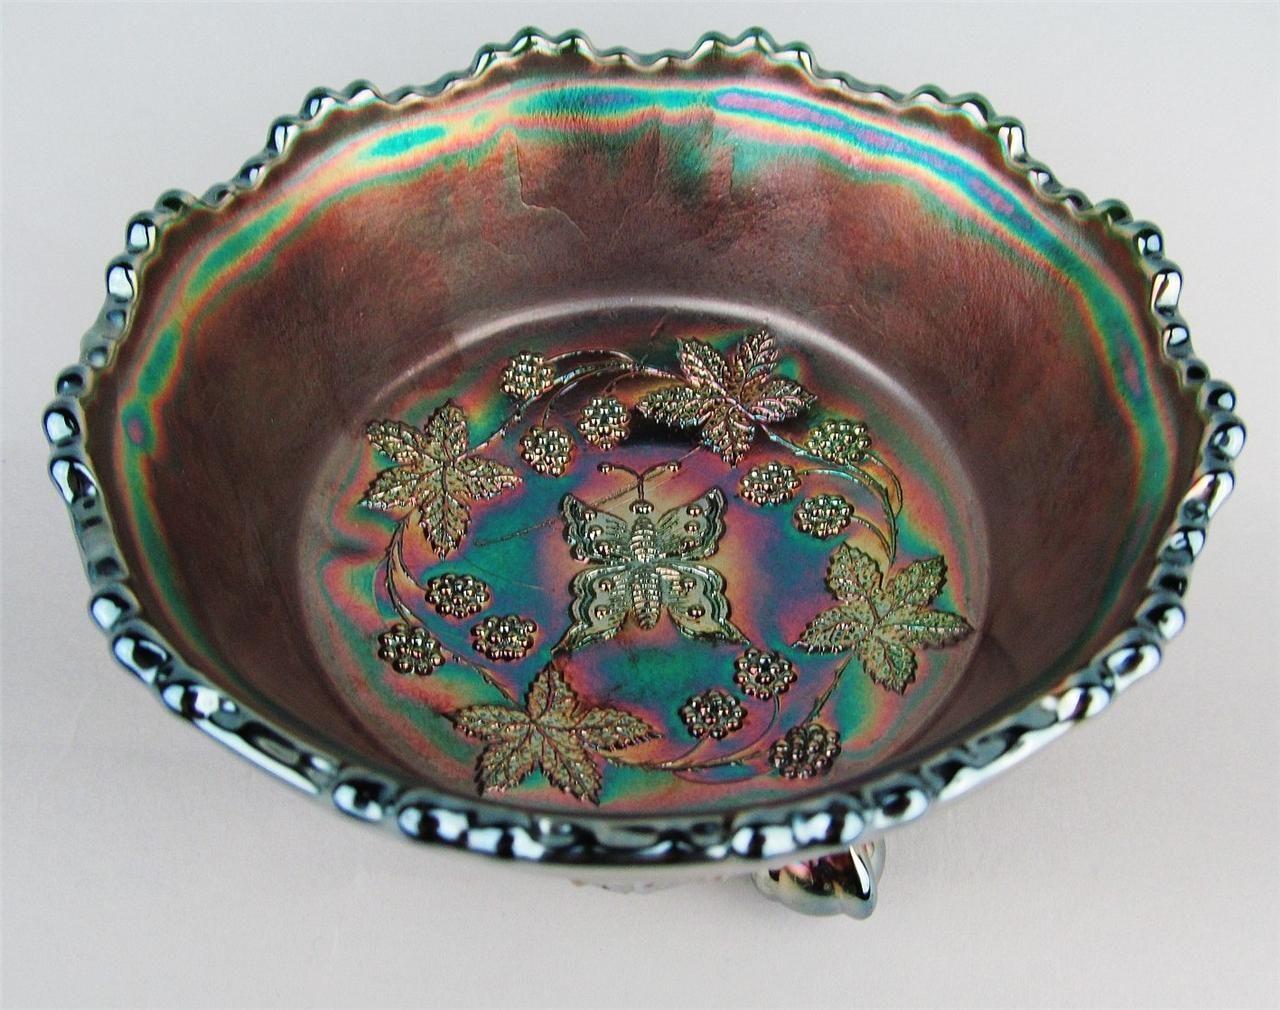 Butterfly berry by fenton green carnival glass 5 berry bowl butterfly berry by fenton green carnival glass 5 berry bowl reviewsmspy